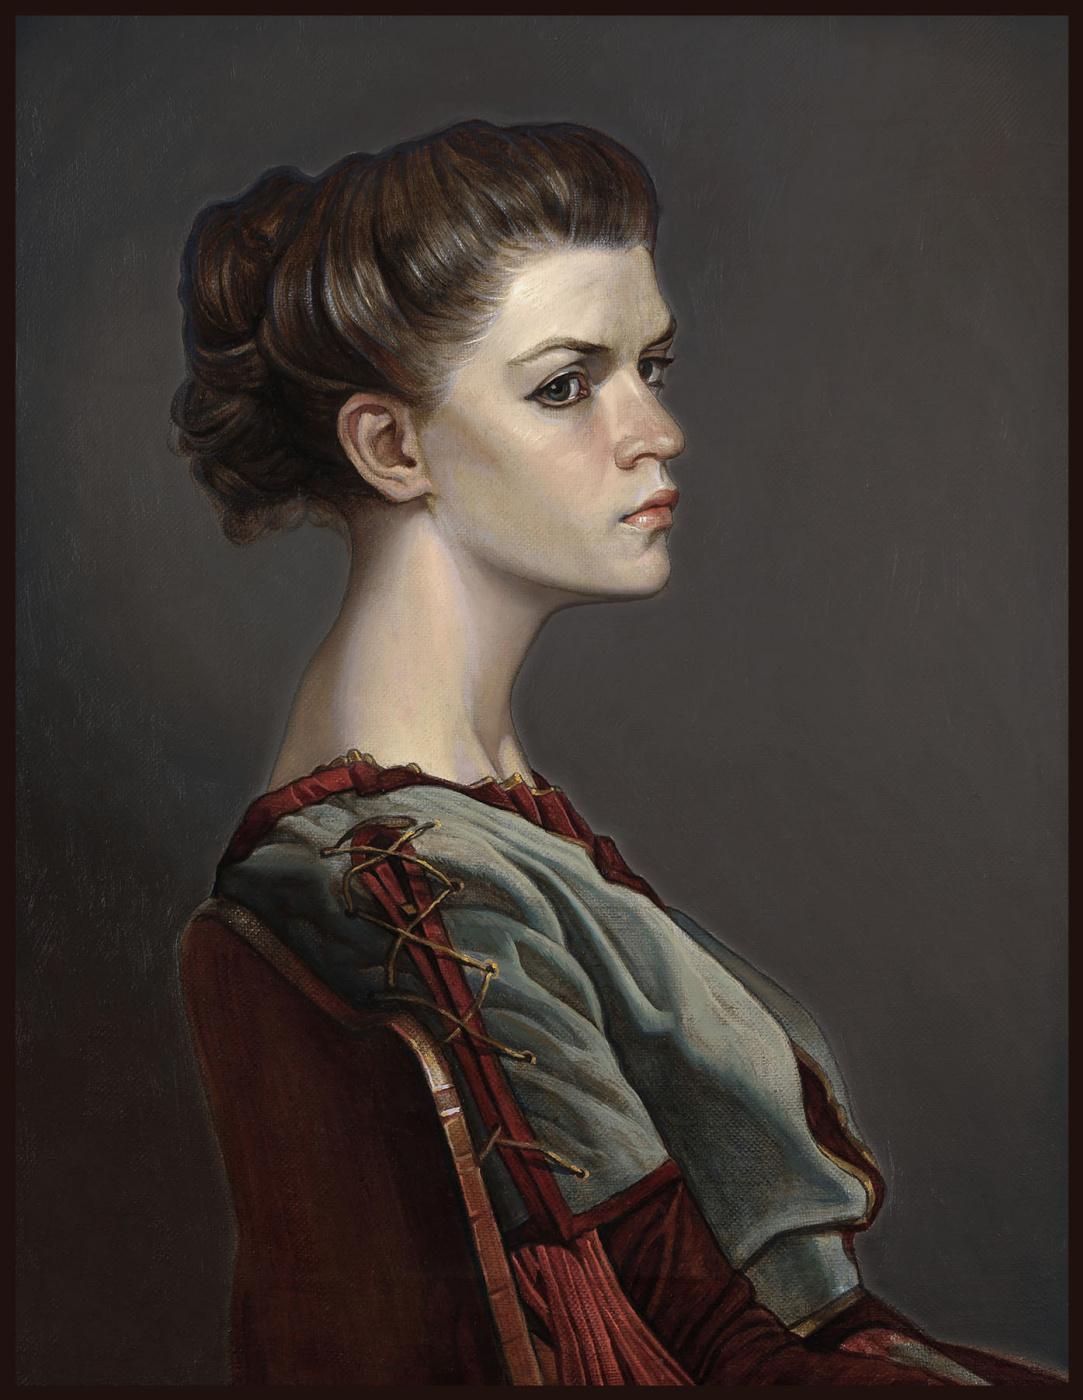 Sushienok64@mail.ru Михайлович Сушенок Игорь. Girl in a renaissance dress.